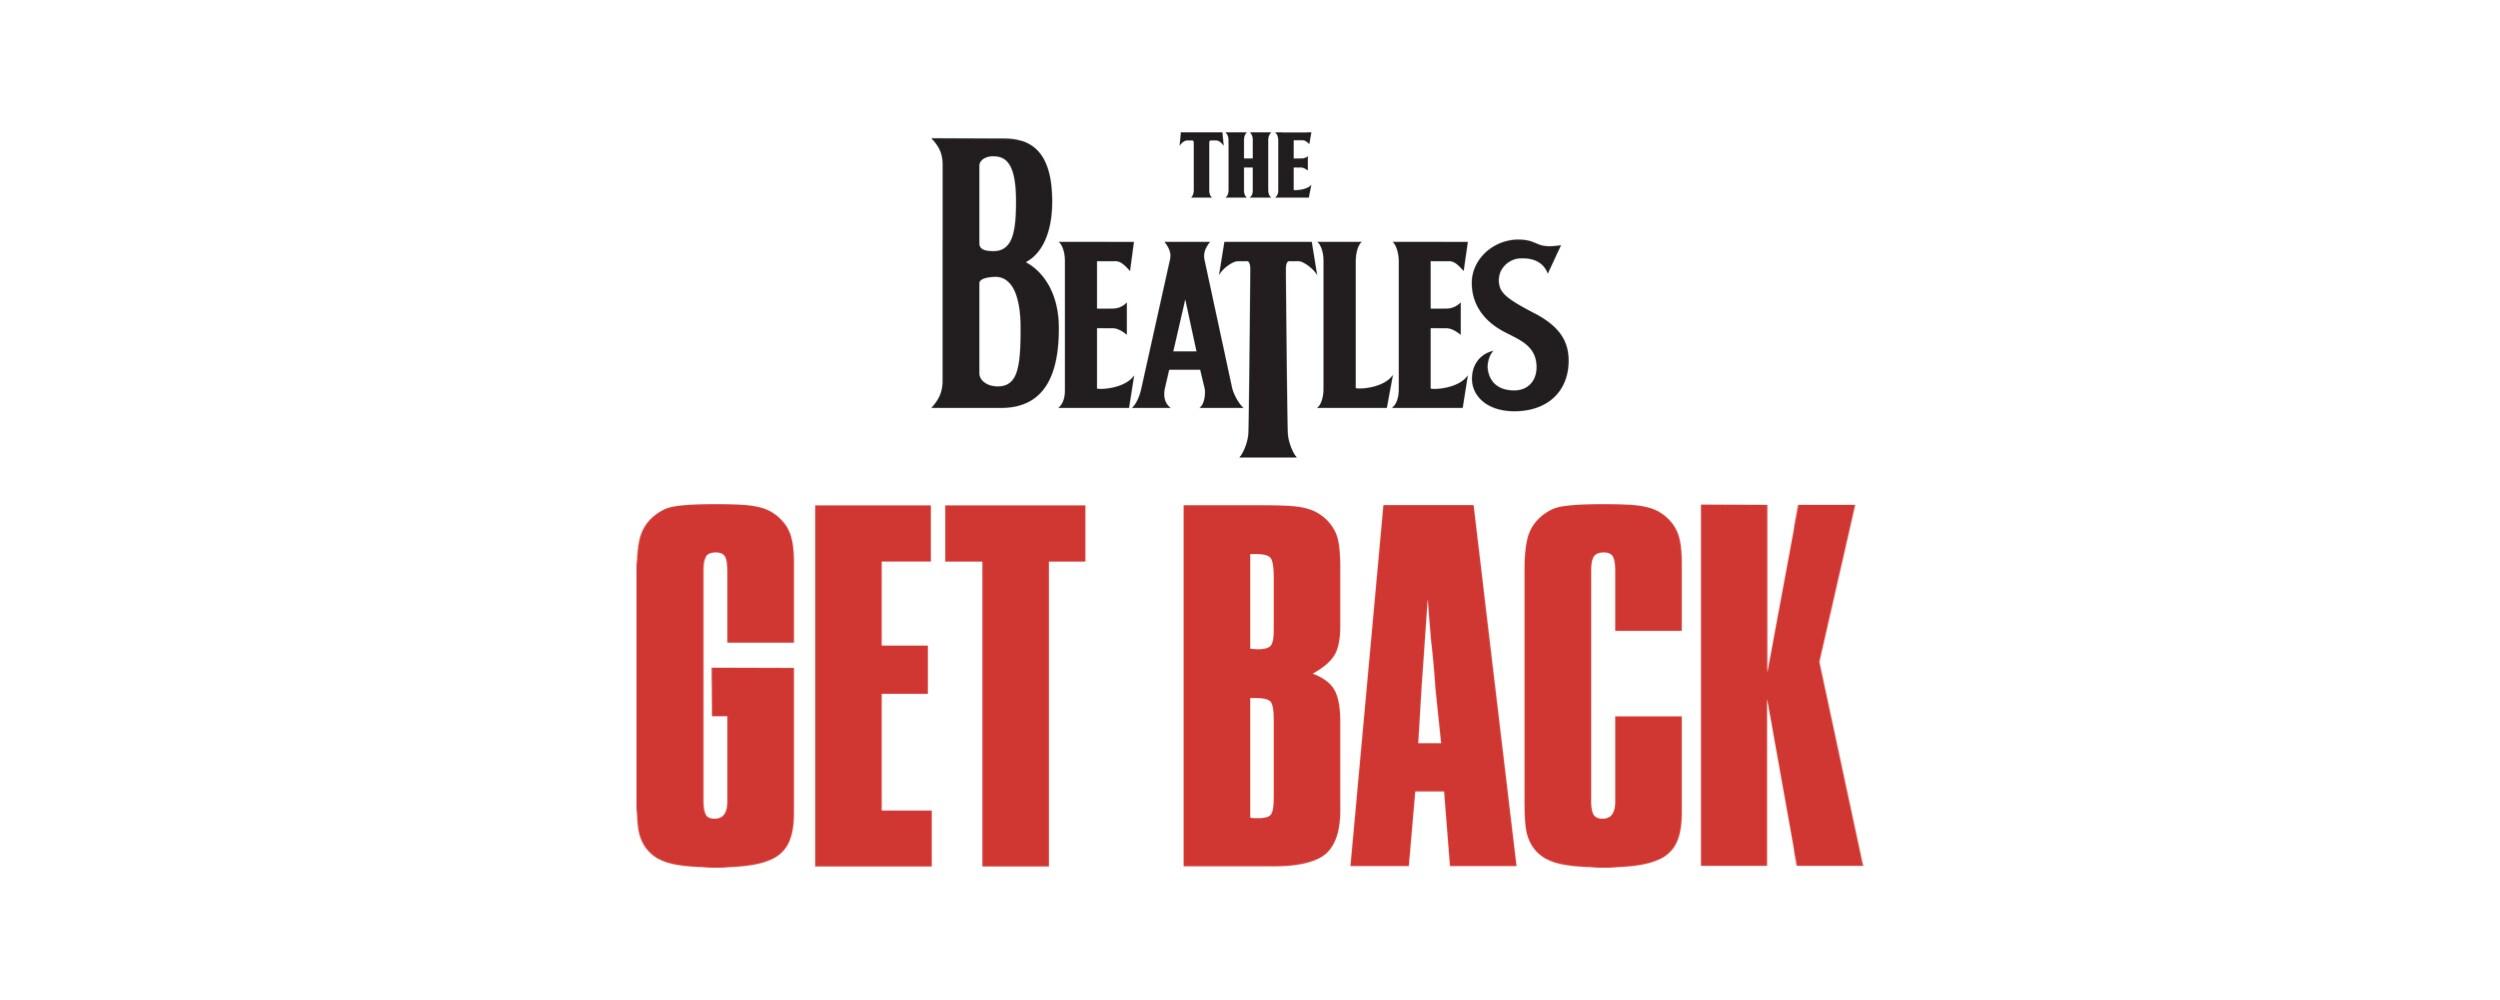 The Beatles: Get Back Media Kit